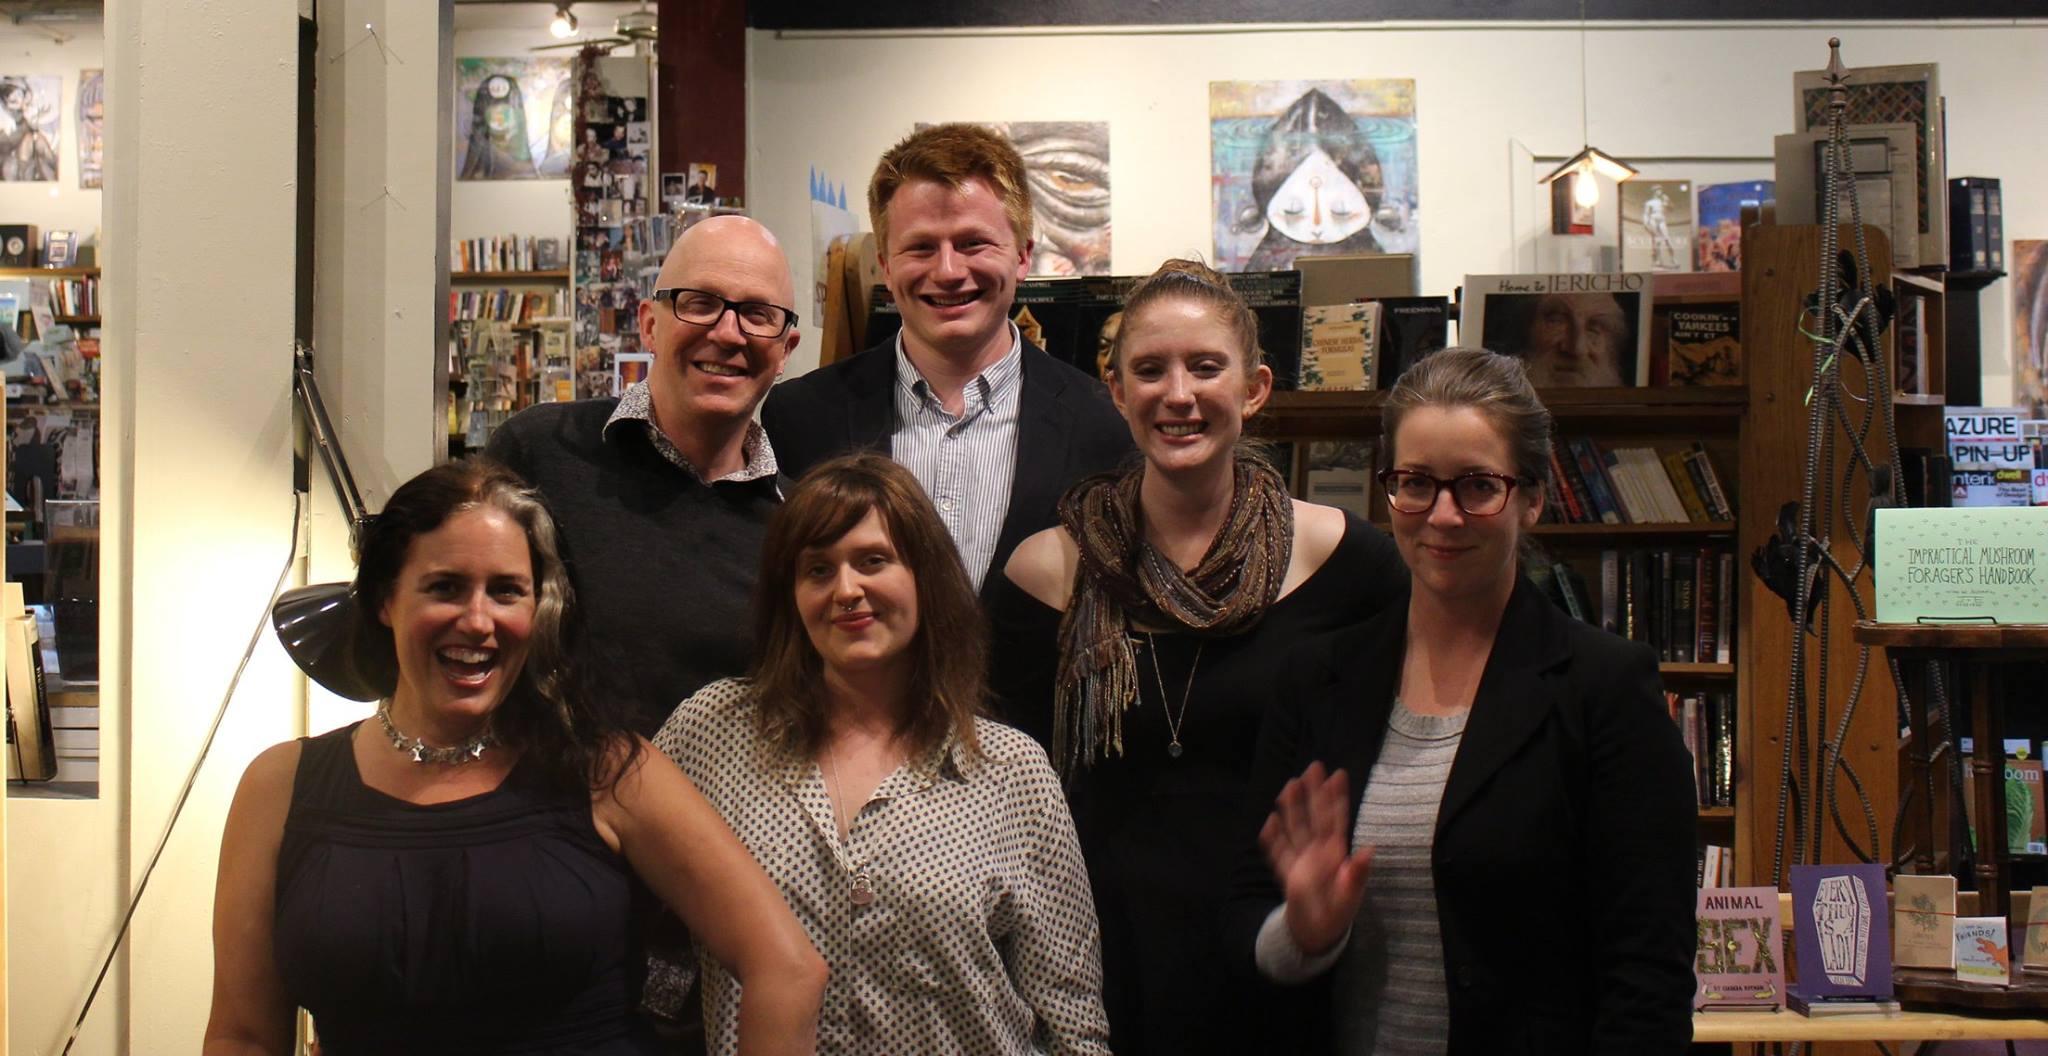 From L to R: Lockie Hunter (hostess), Gary Hawkins, Caroline Wilson, Michael Pittard, Stephanie Johnson and...me. Awkwardly waving.